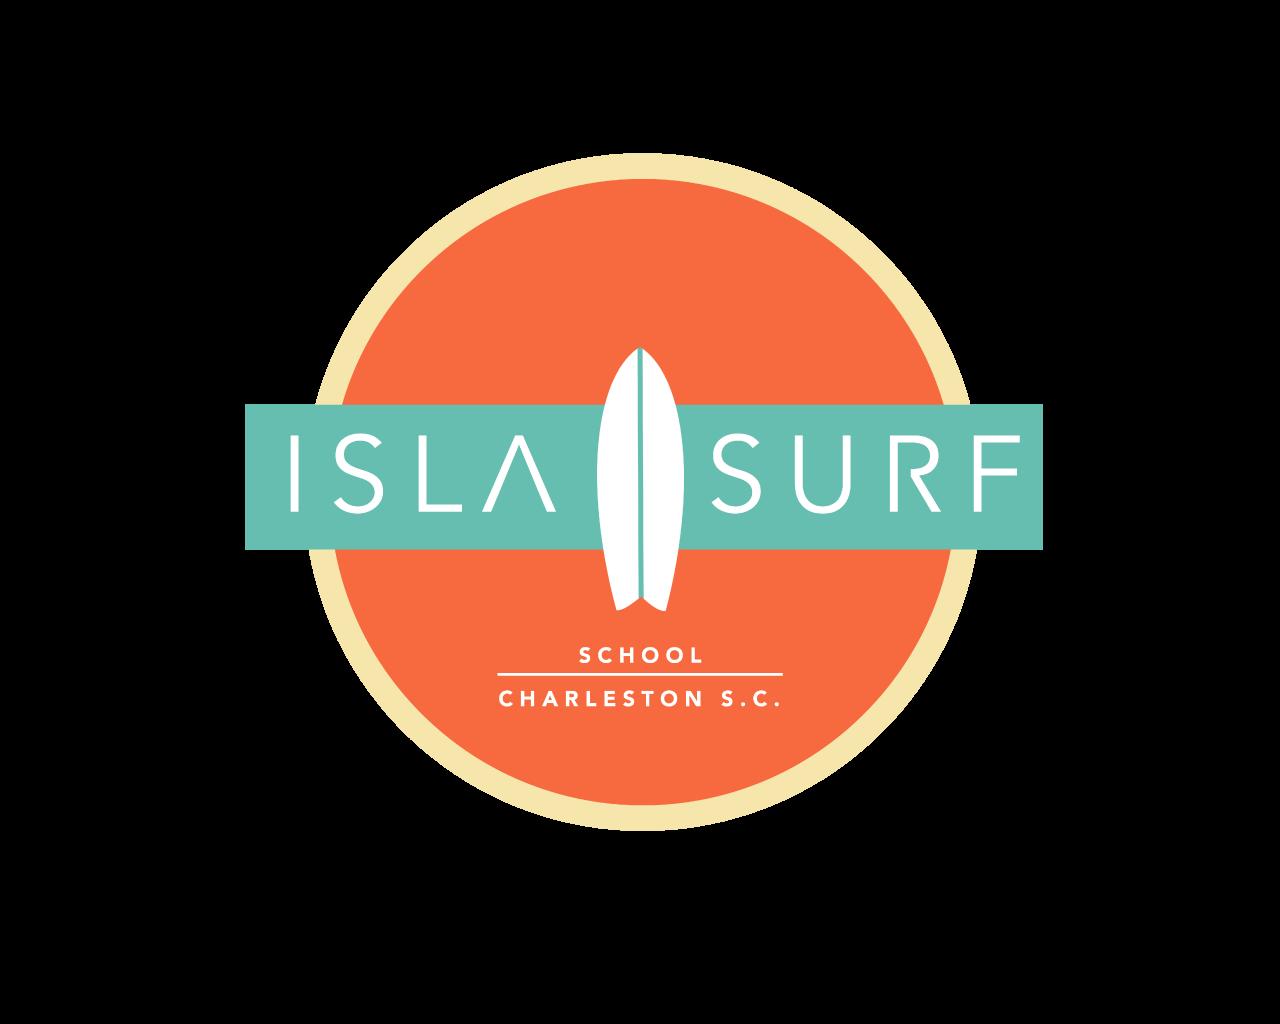 isla surf school.png